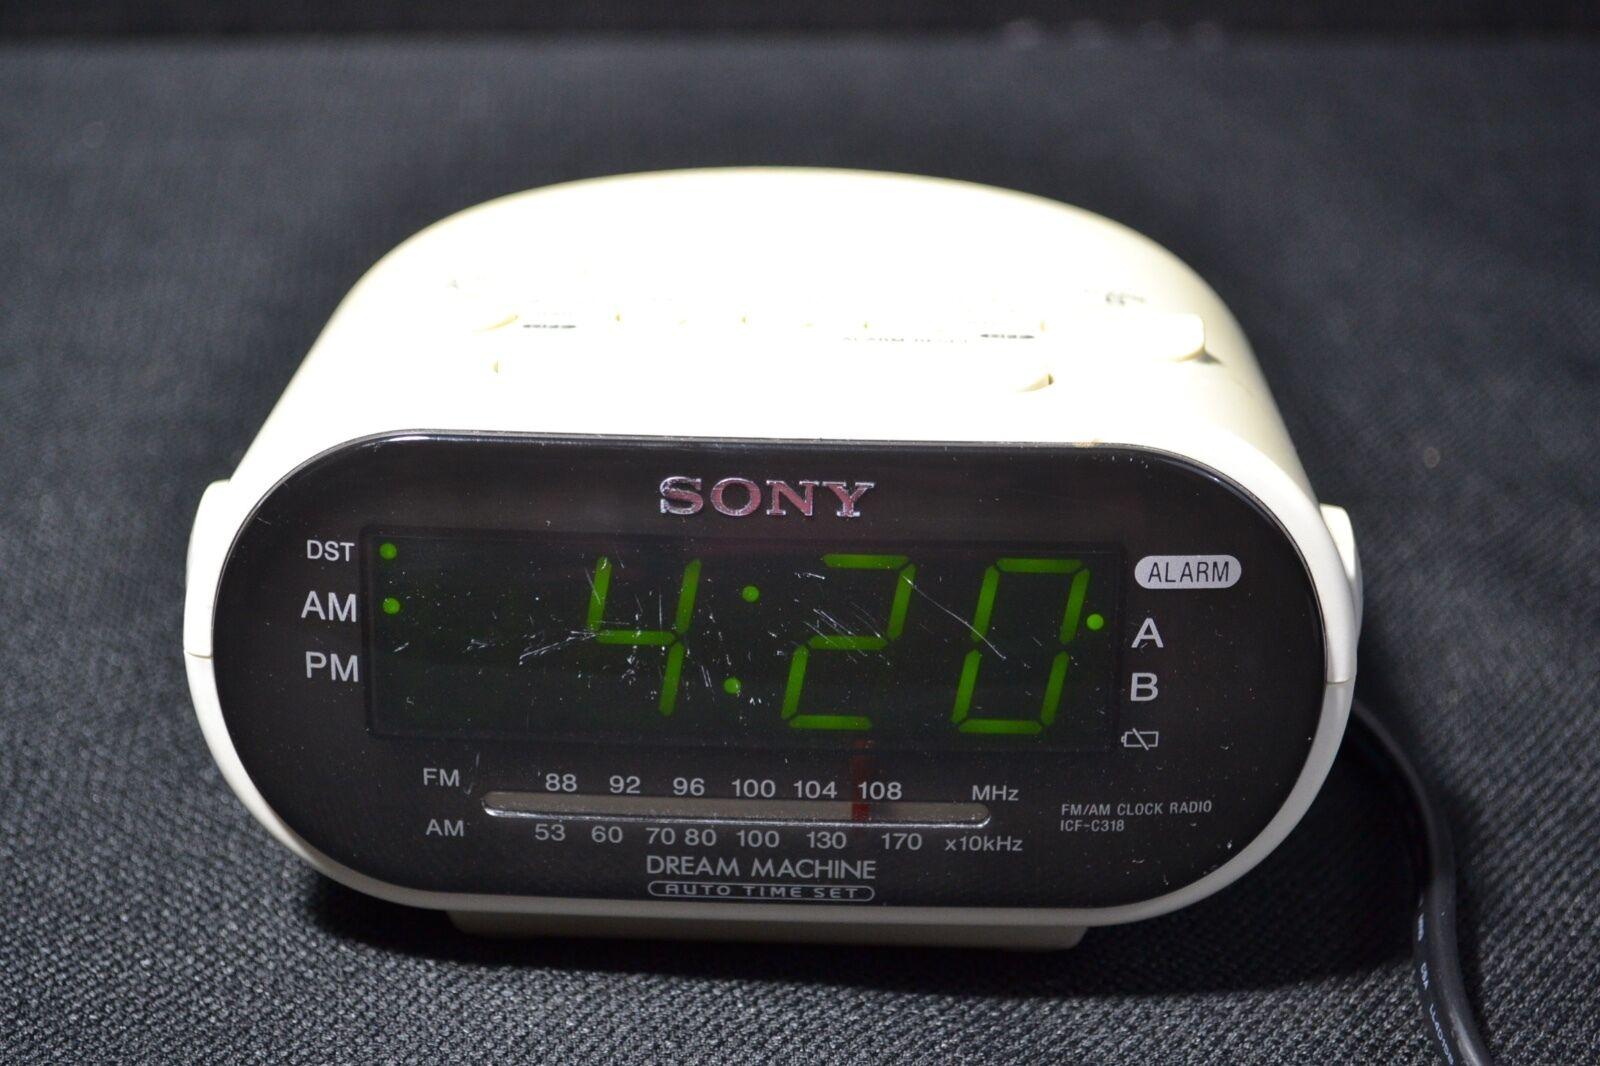 SONY ICF-C318 FM AM Clock Radio White Dream Machine